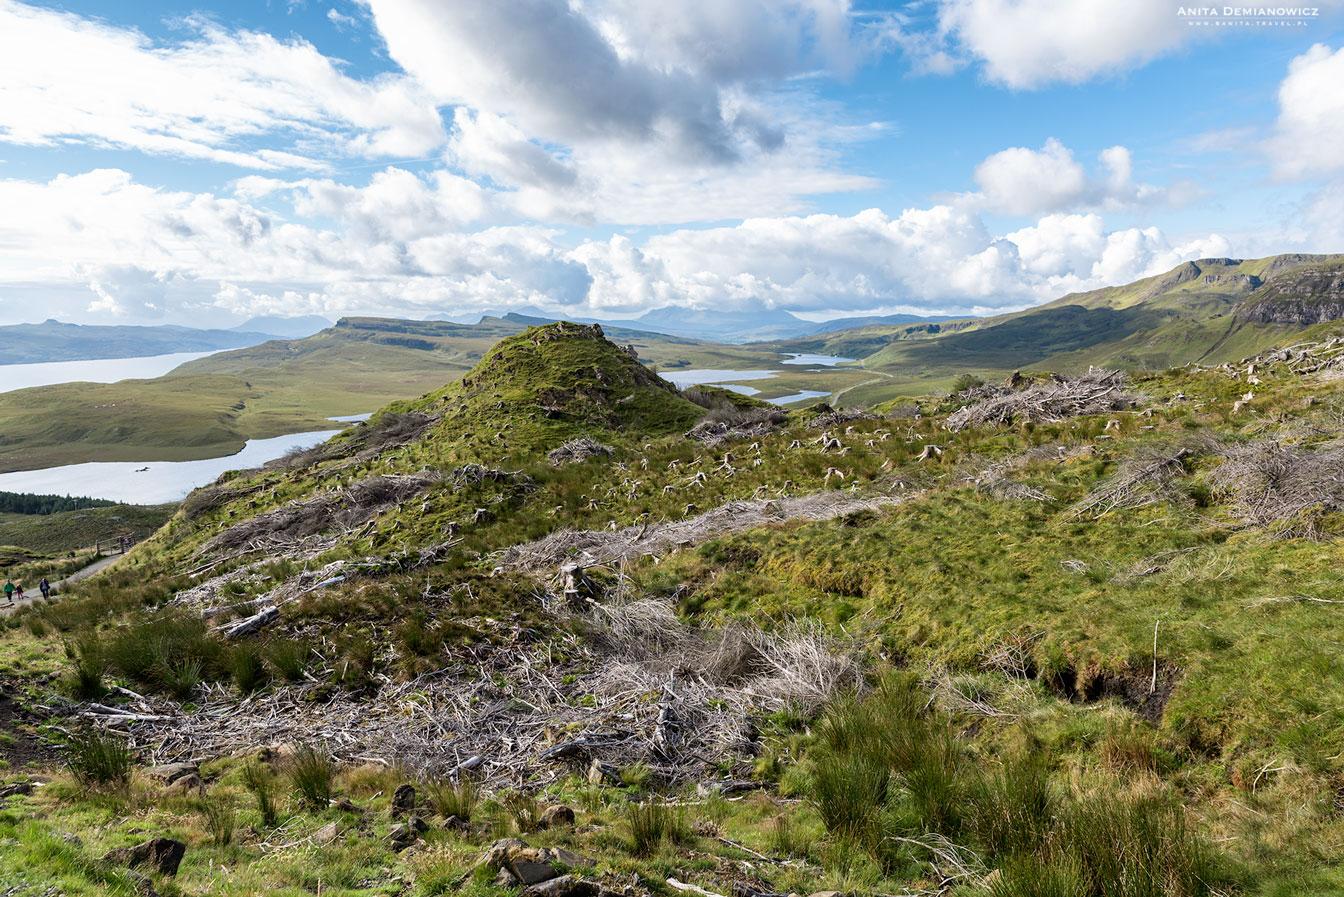 Old Man of Storr, Szkocja, Isle of Skye